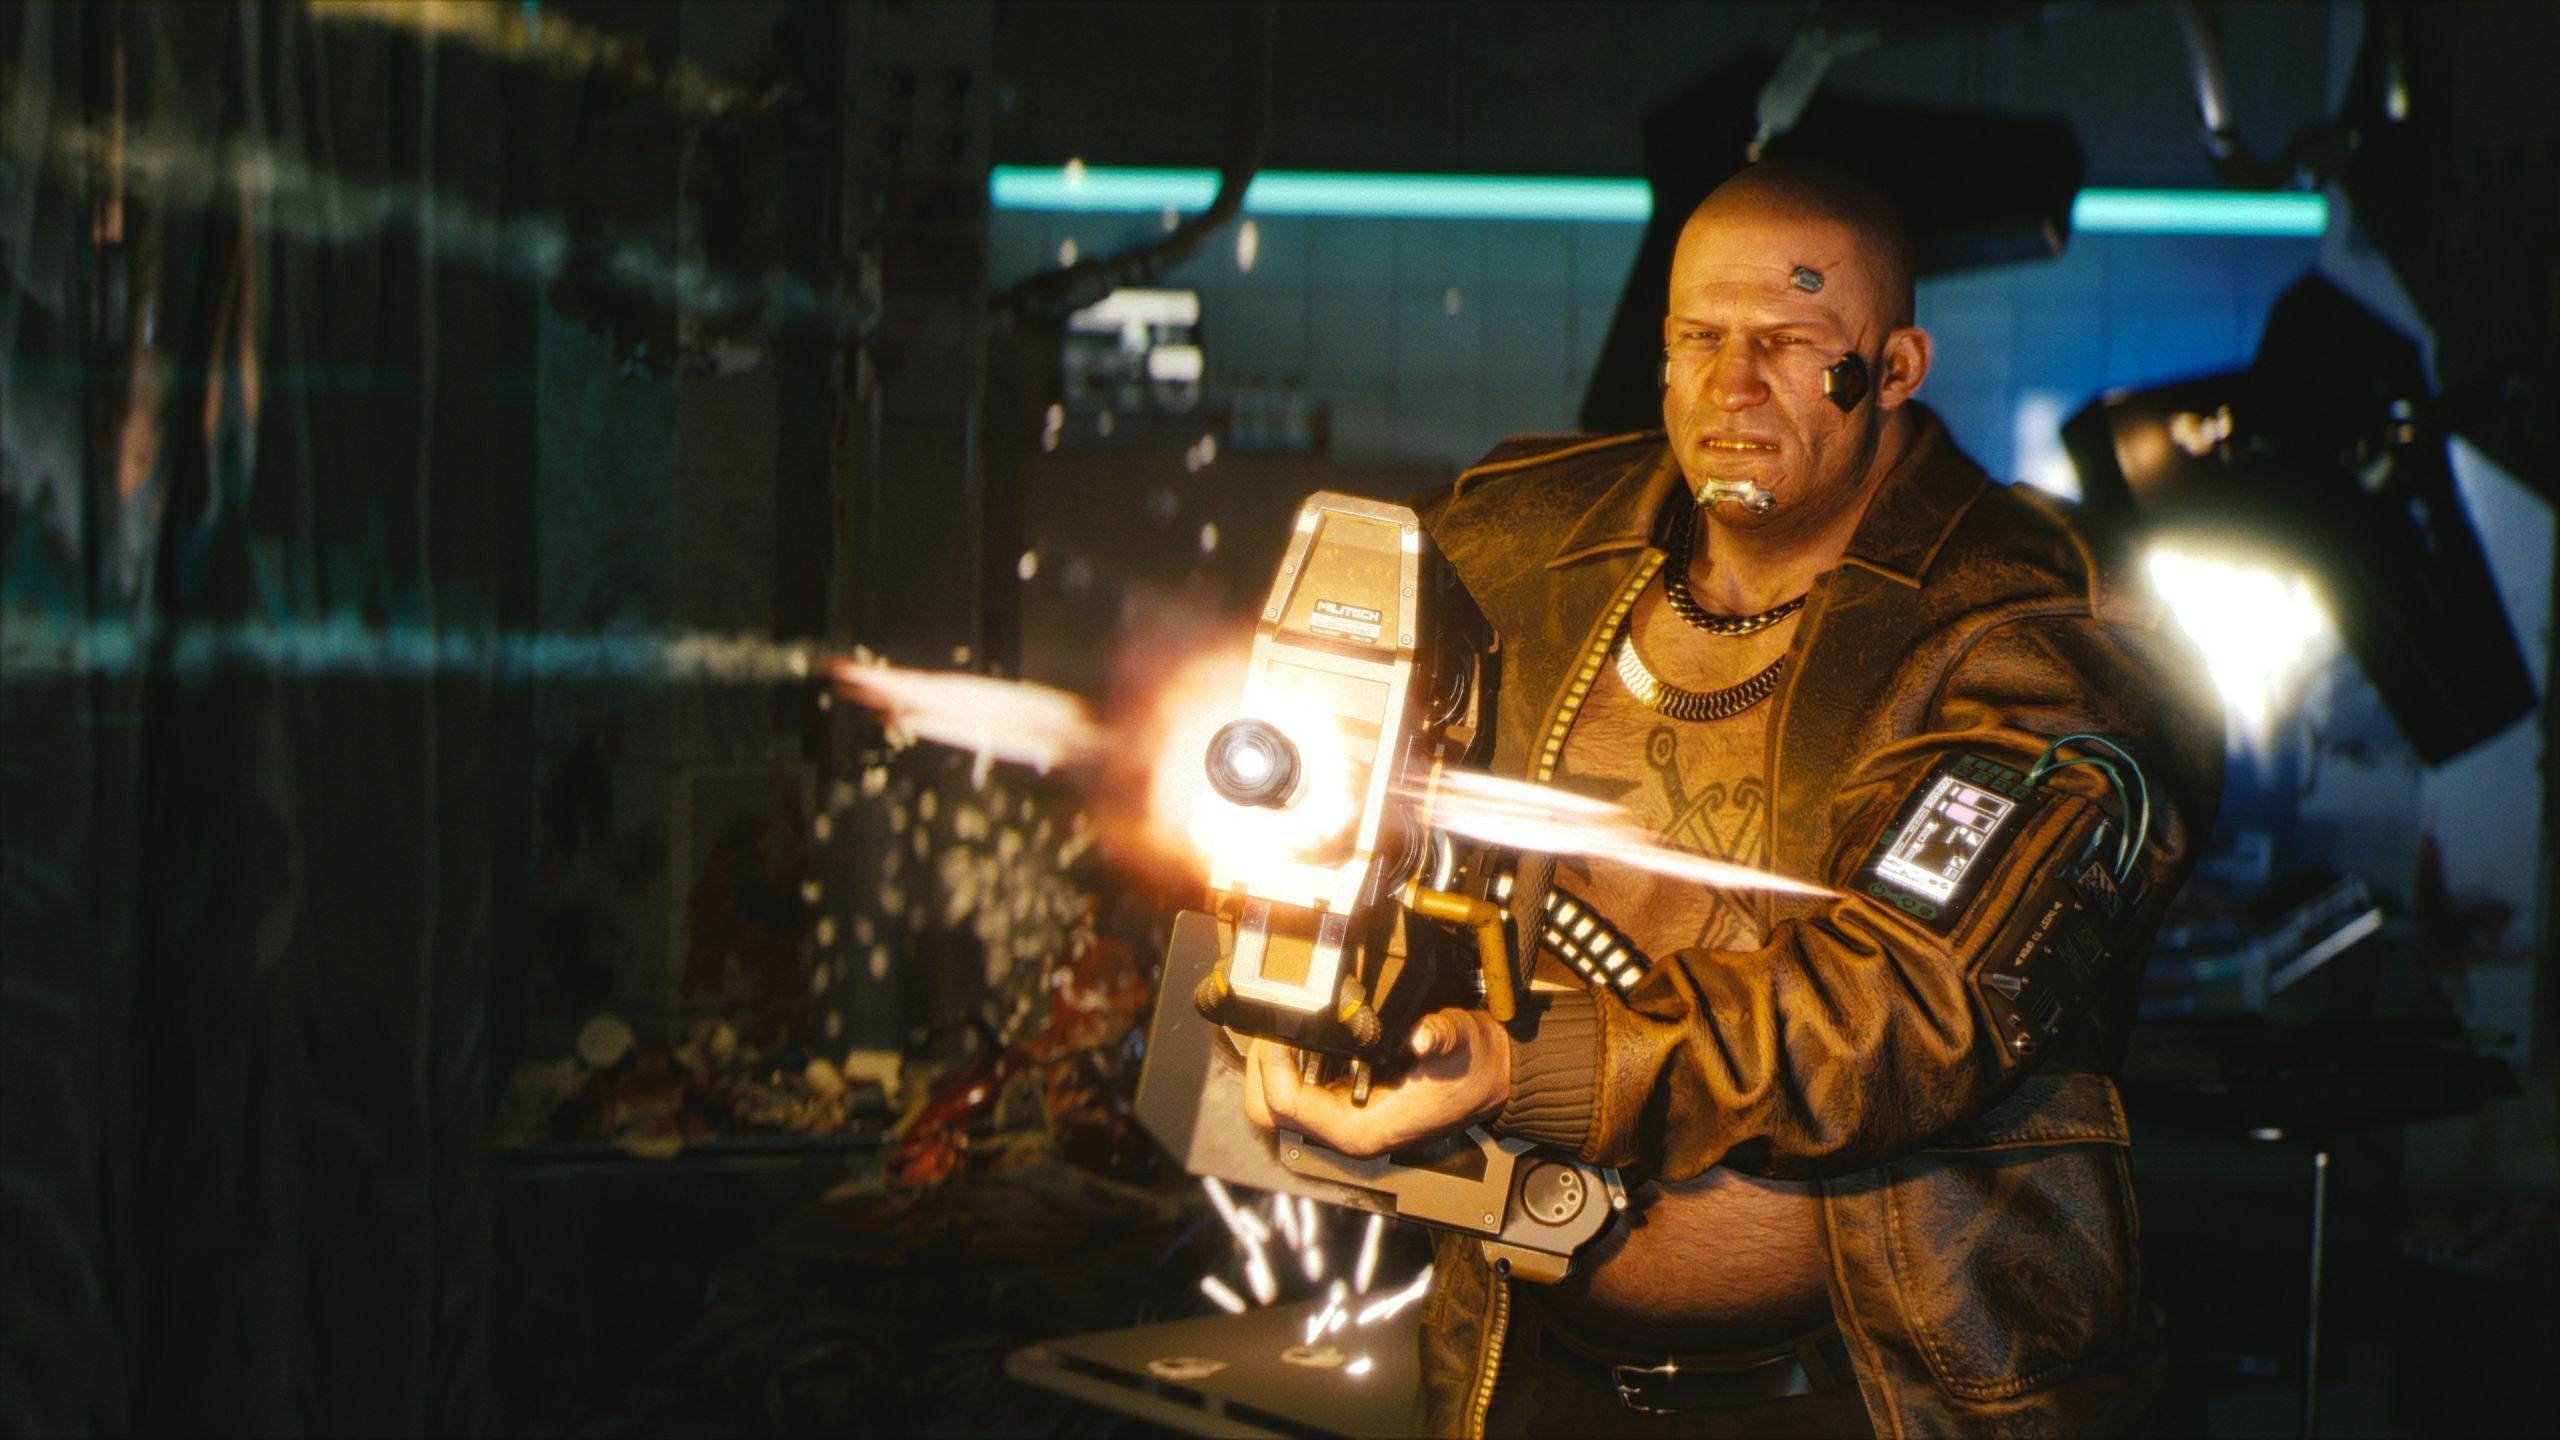 A man firing a massive weapon towards the camera